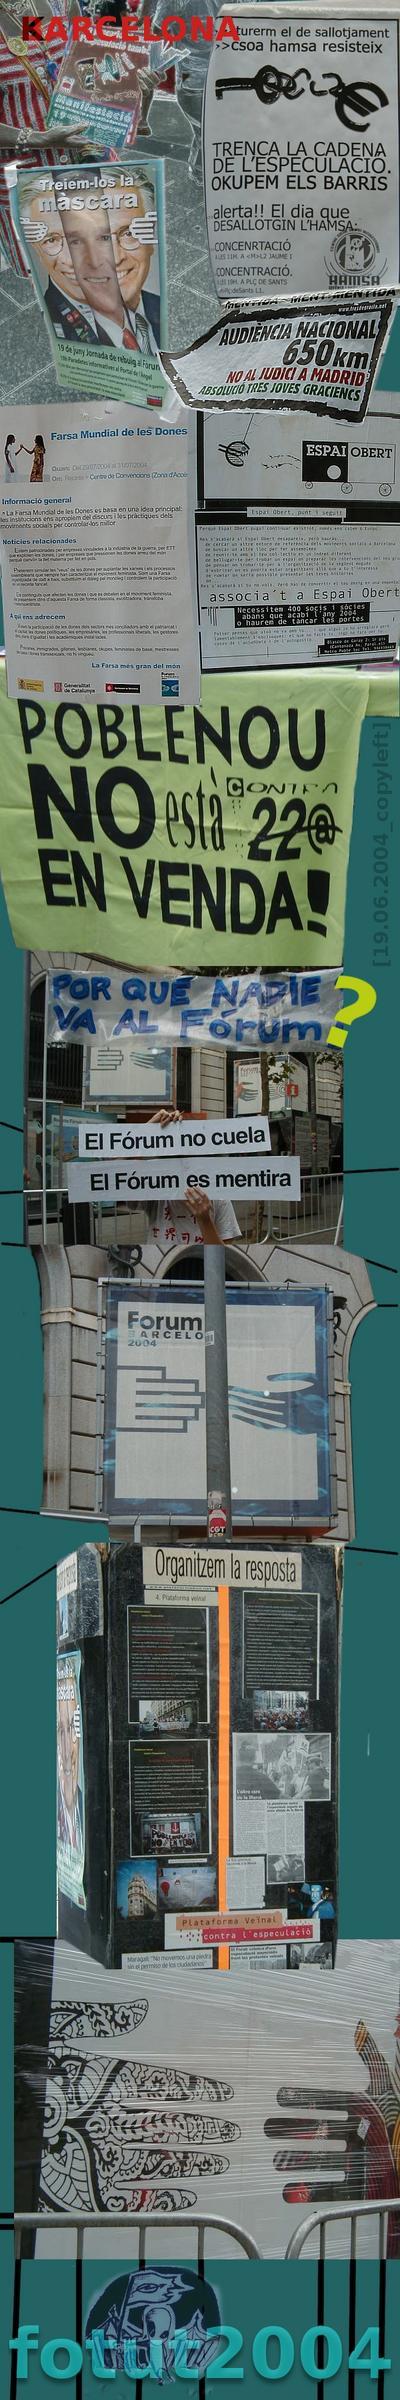 montage_paraetas_fotut.jpg